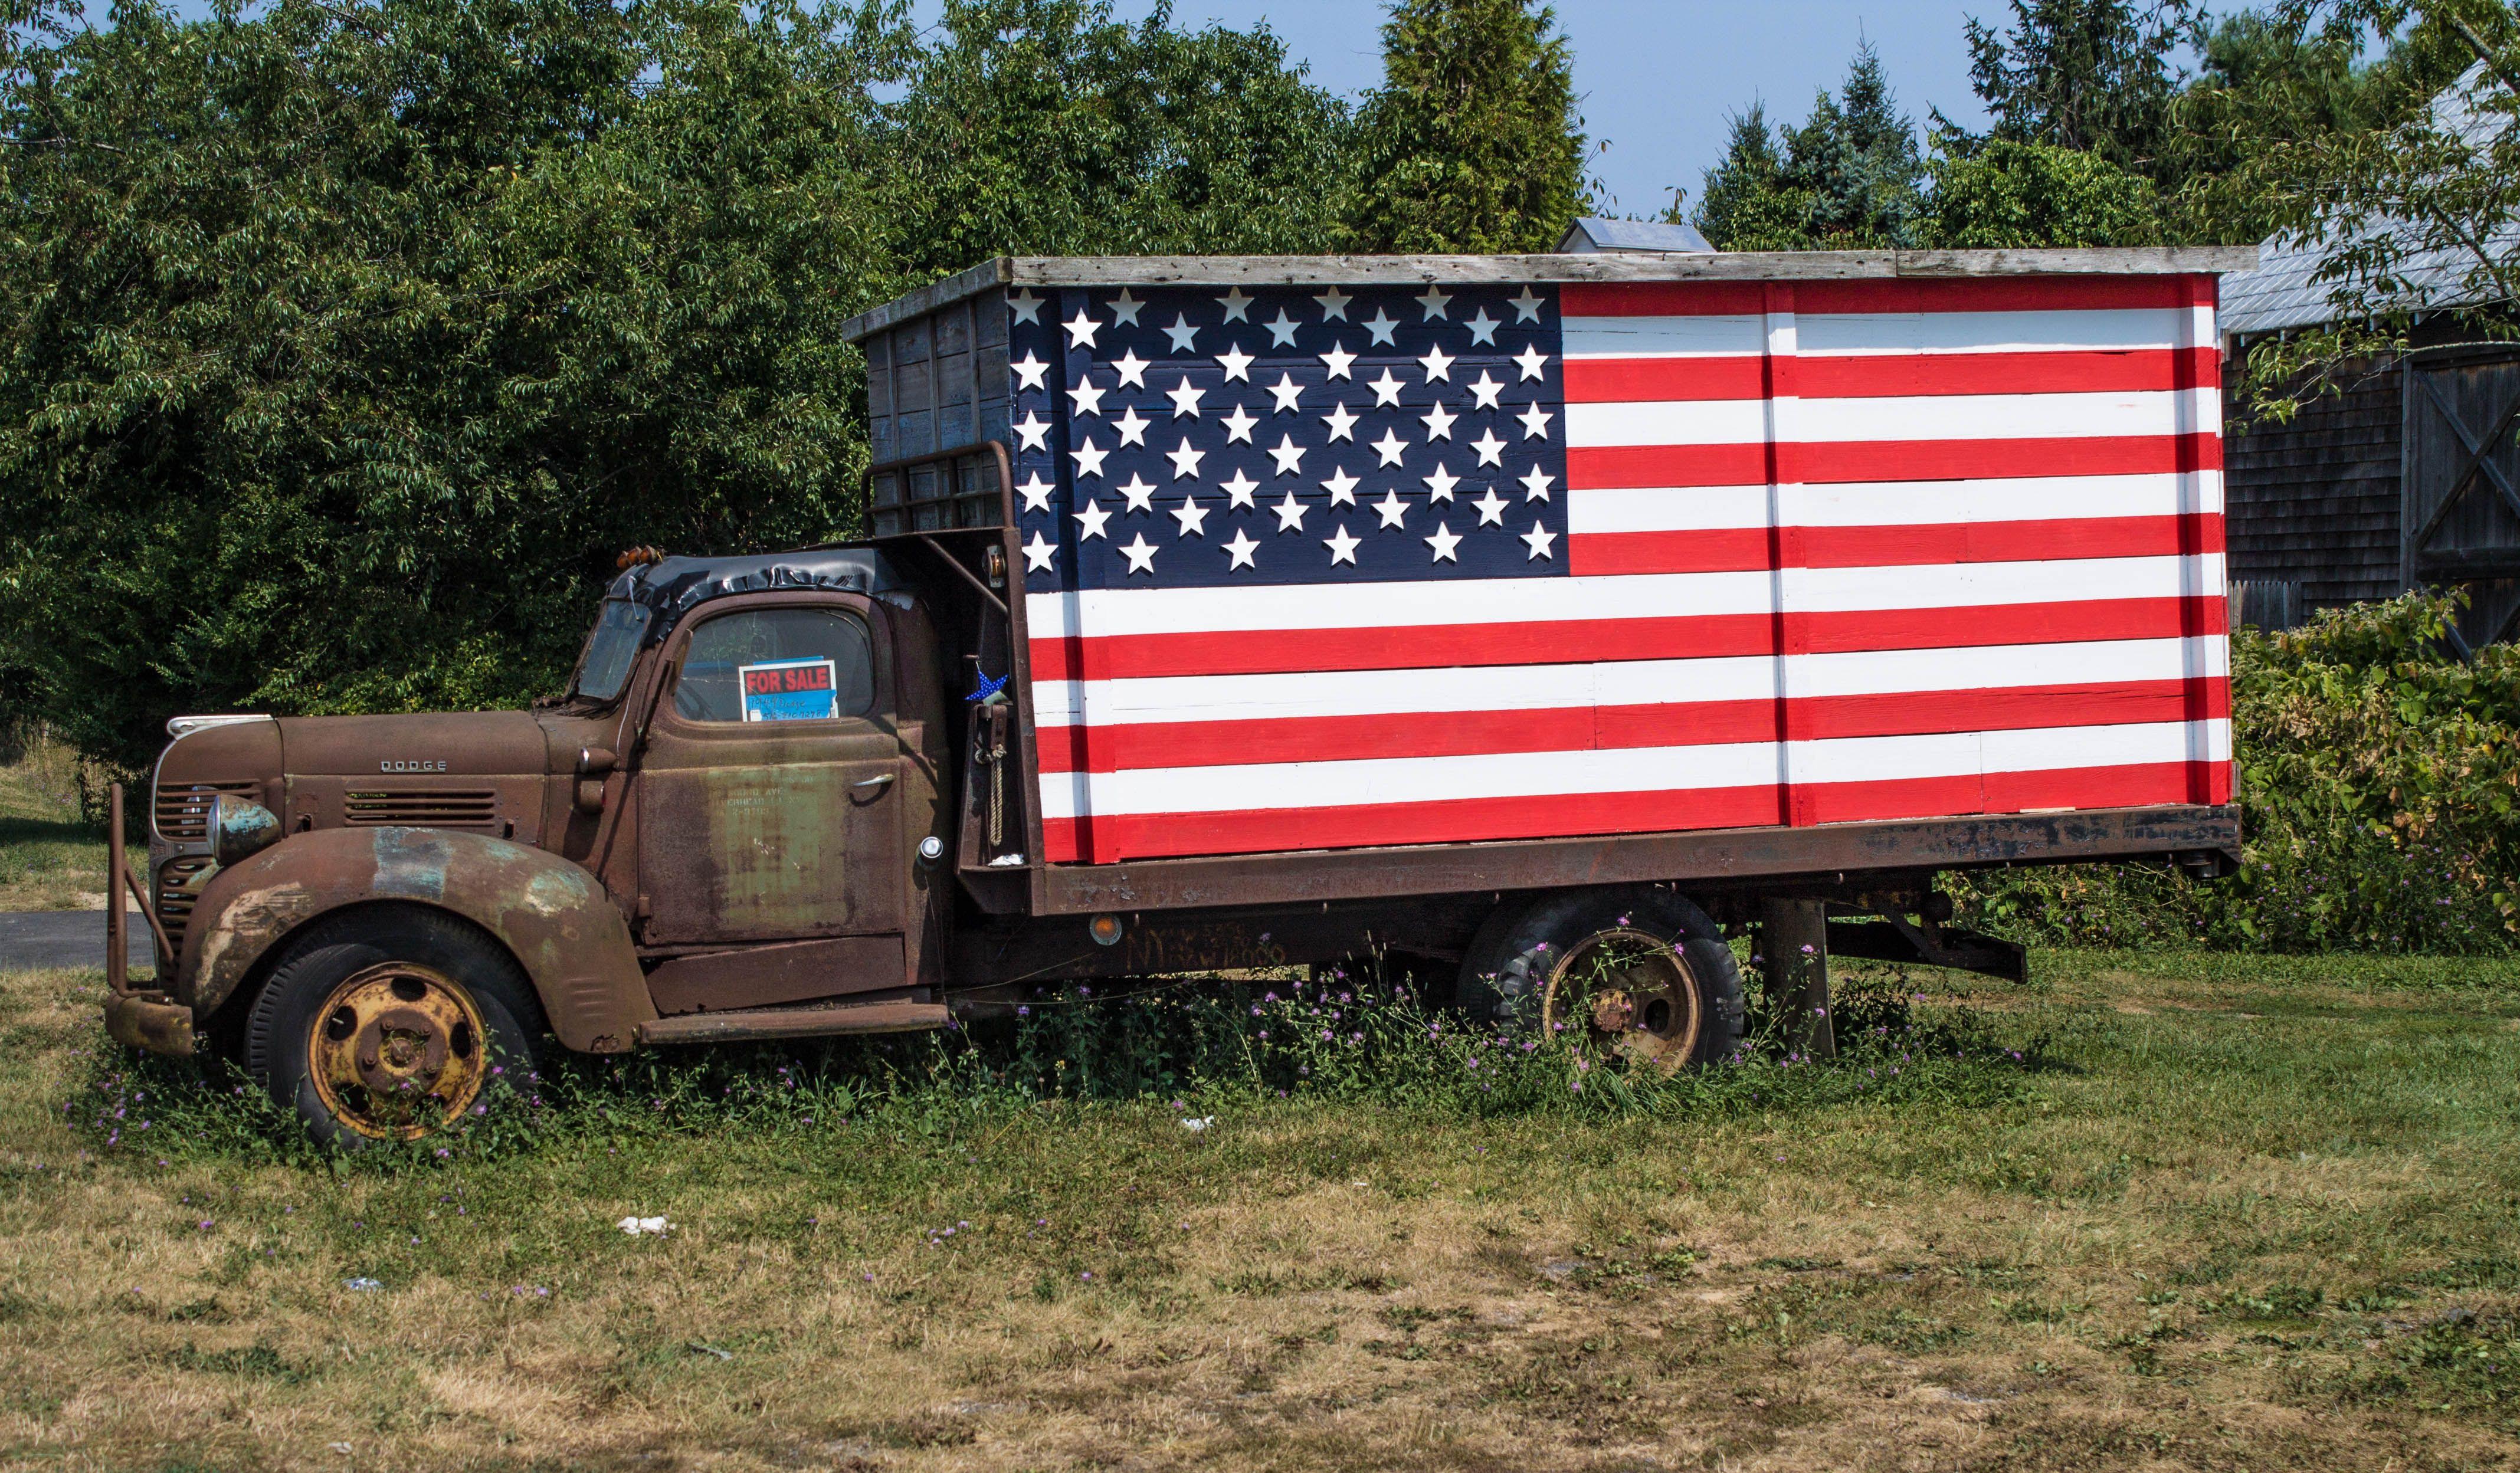 Old American Dodge truck Mattituck New York 09 03 2015